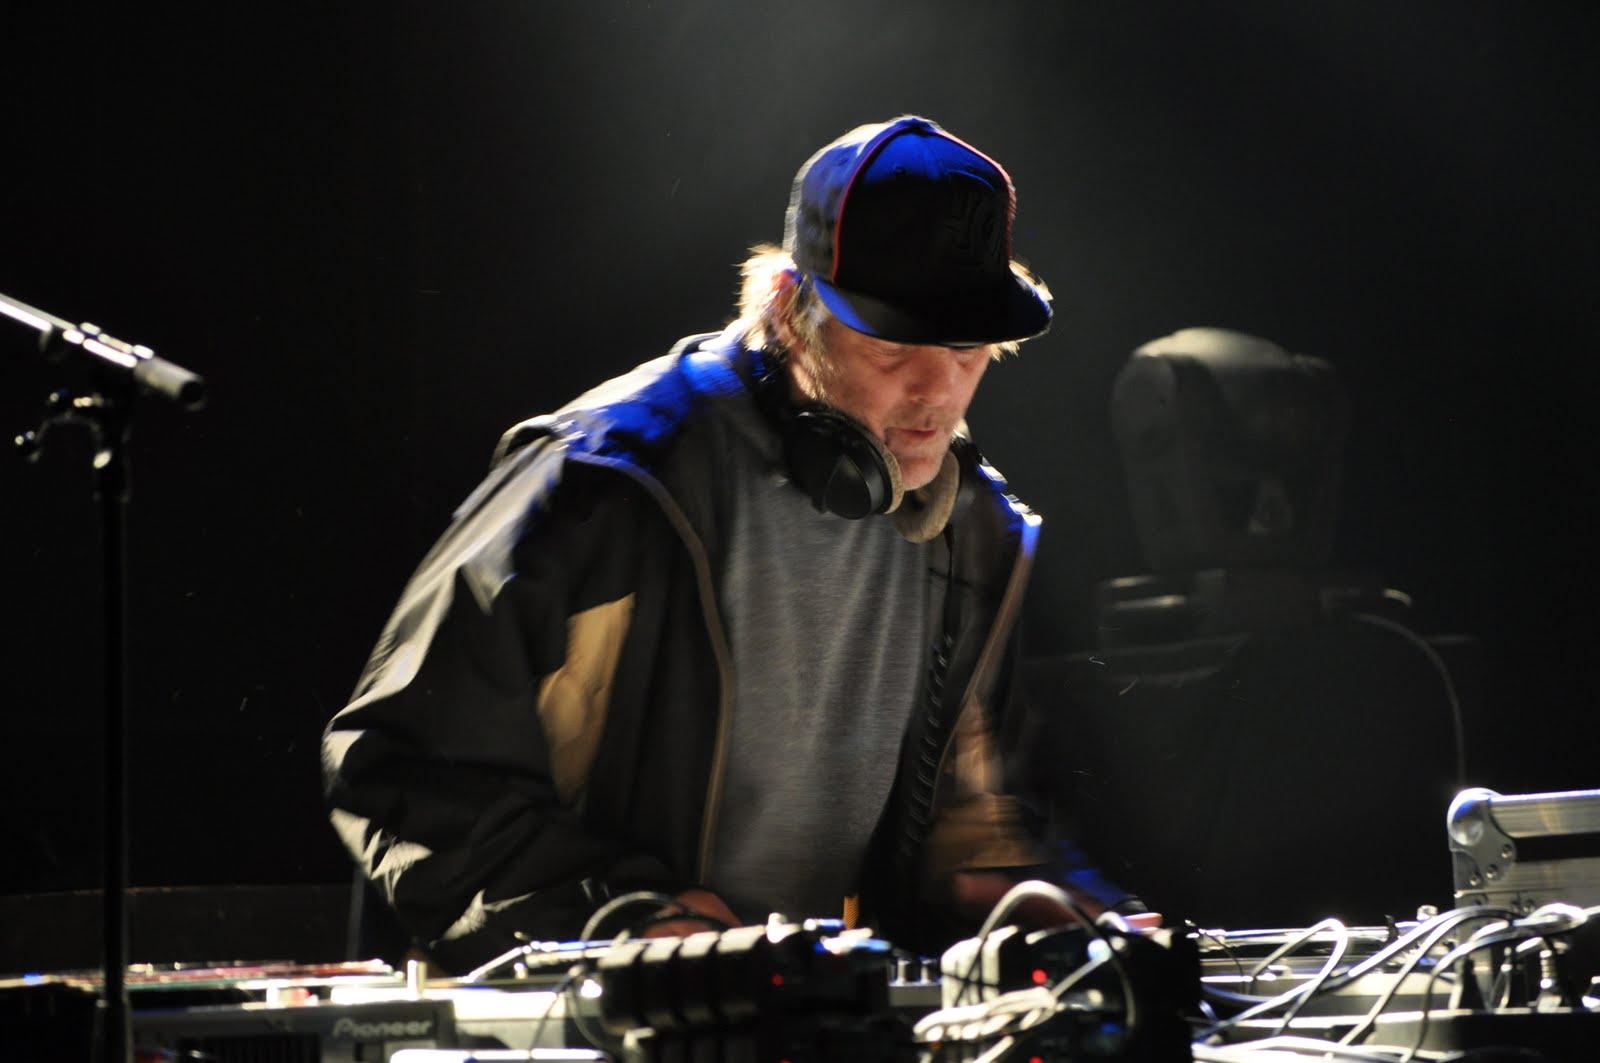 PLAYLIST056 – Dee Nasty (Boom Bap – Reims Hip-Hop Festival)